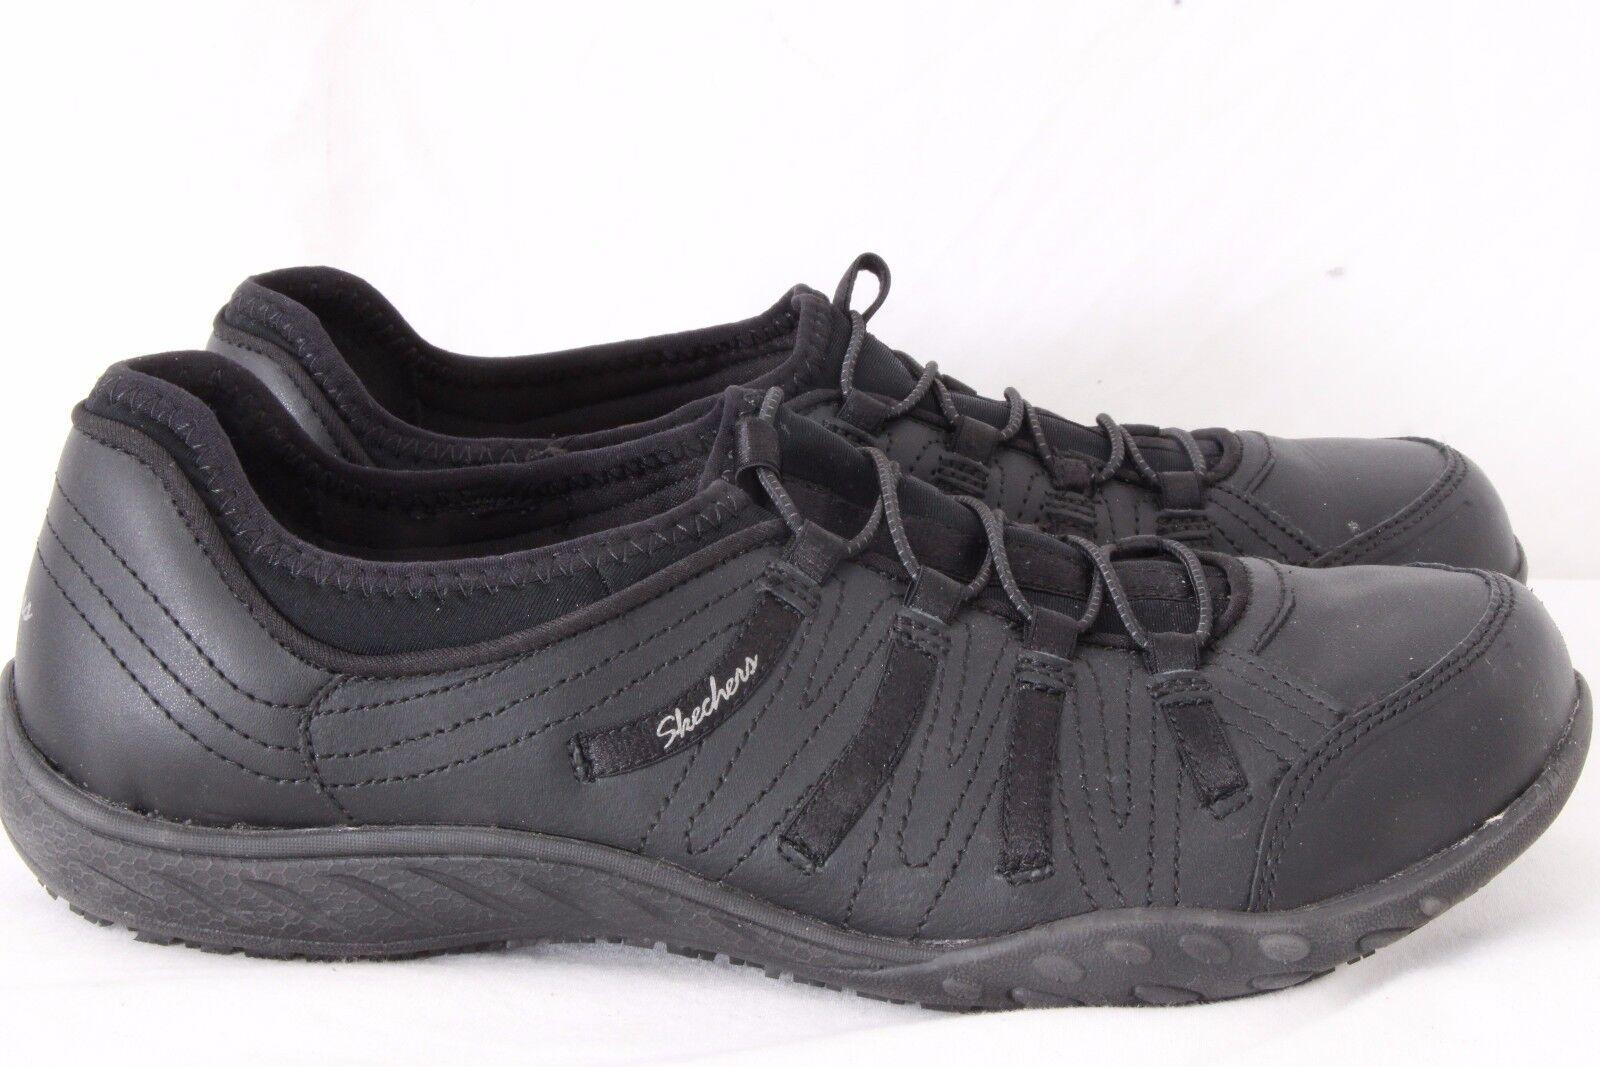 Skechers 76578 Rodessa Relaxed Fit Work Slip Resistant Sneaker Women's US 9.5